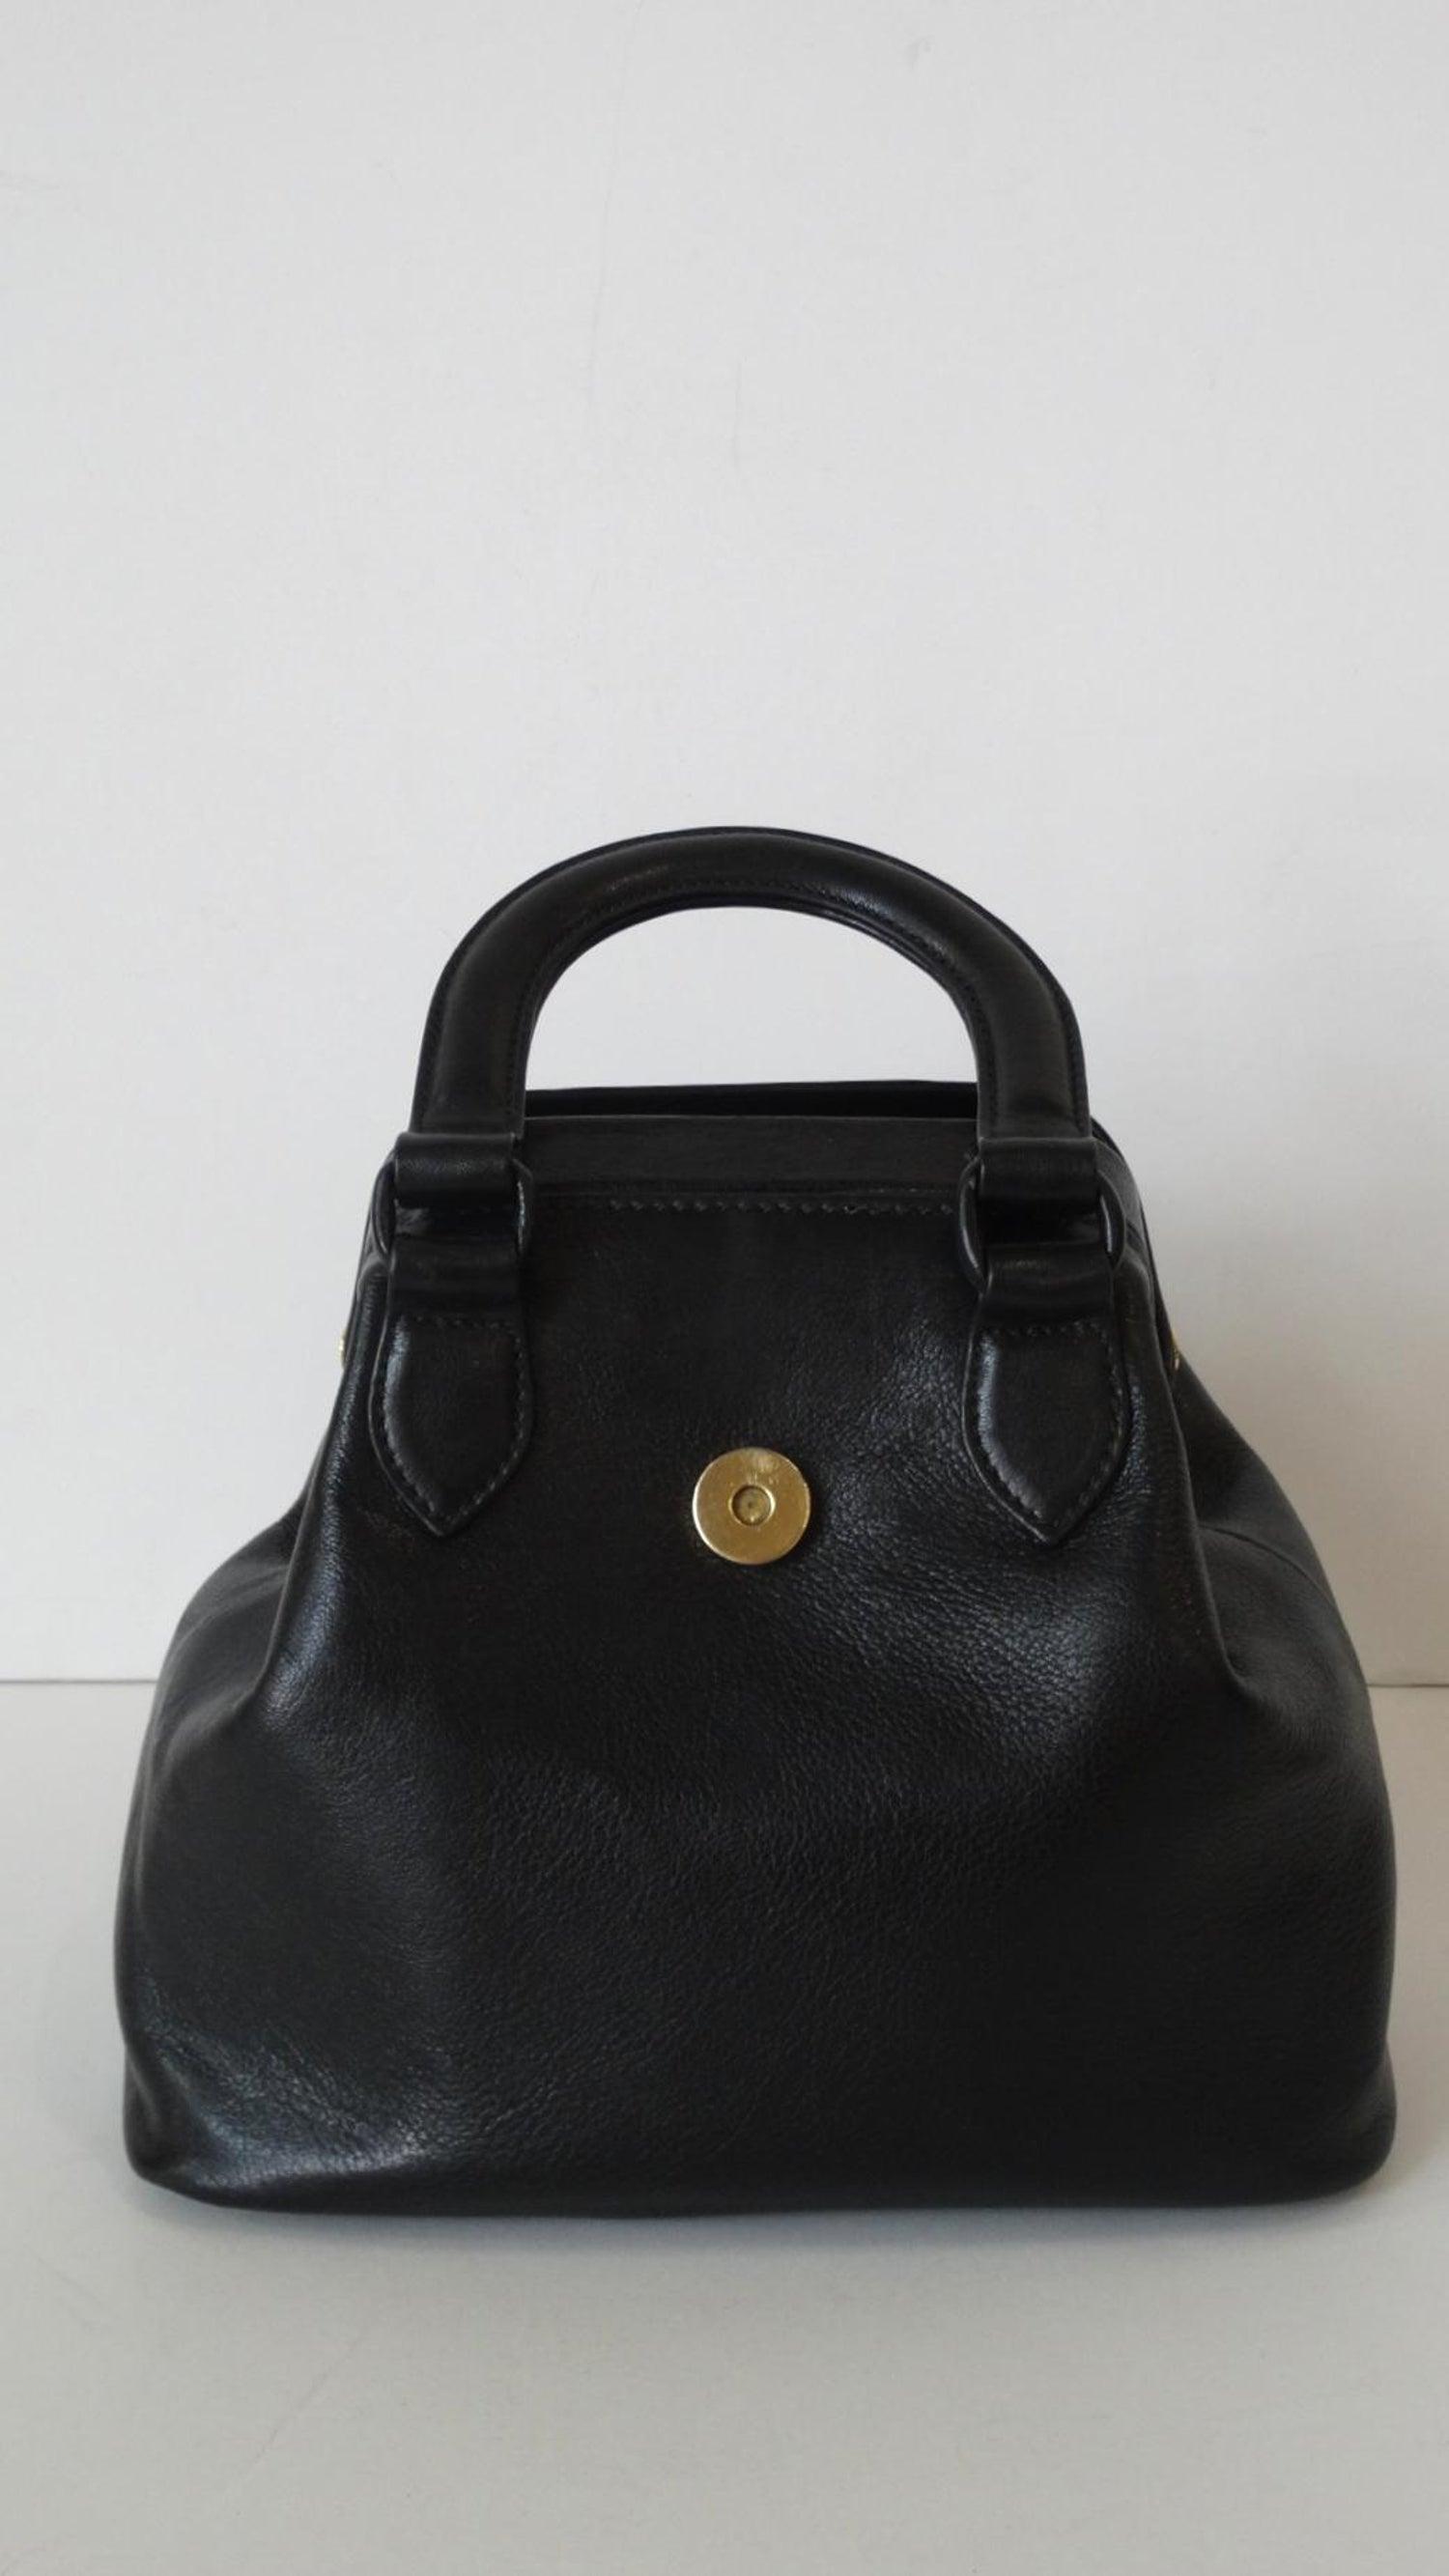 3061a4b994 1990s Gianni Versace Black Leather Handbag at 1stdibs